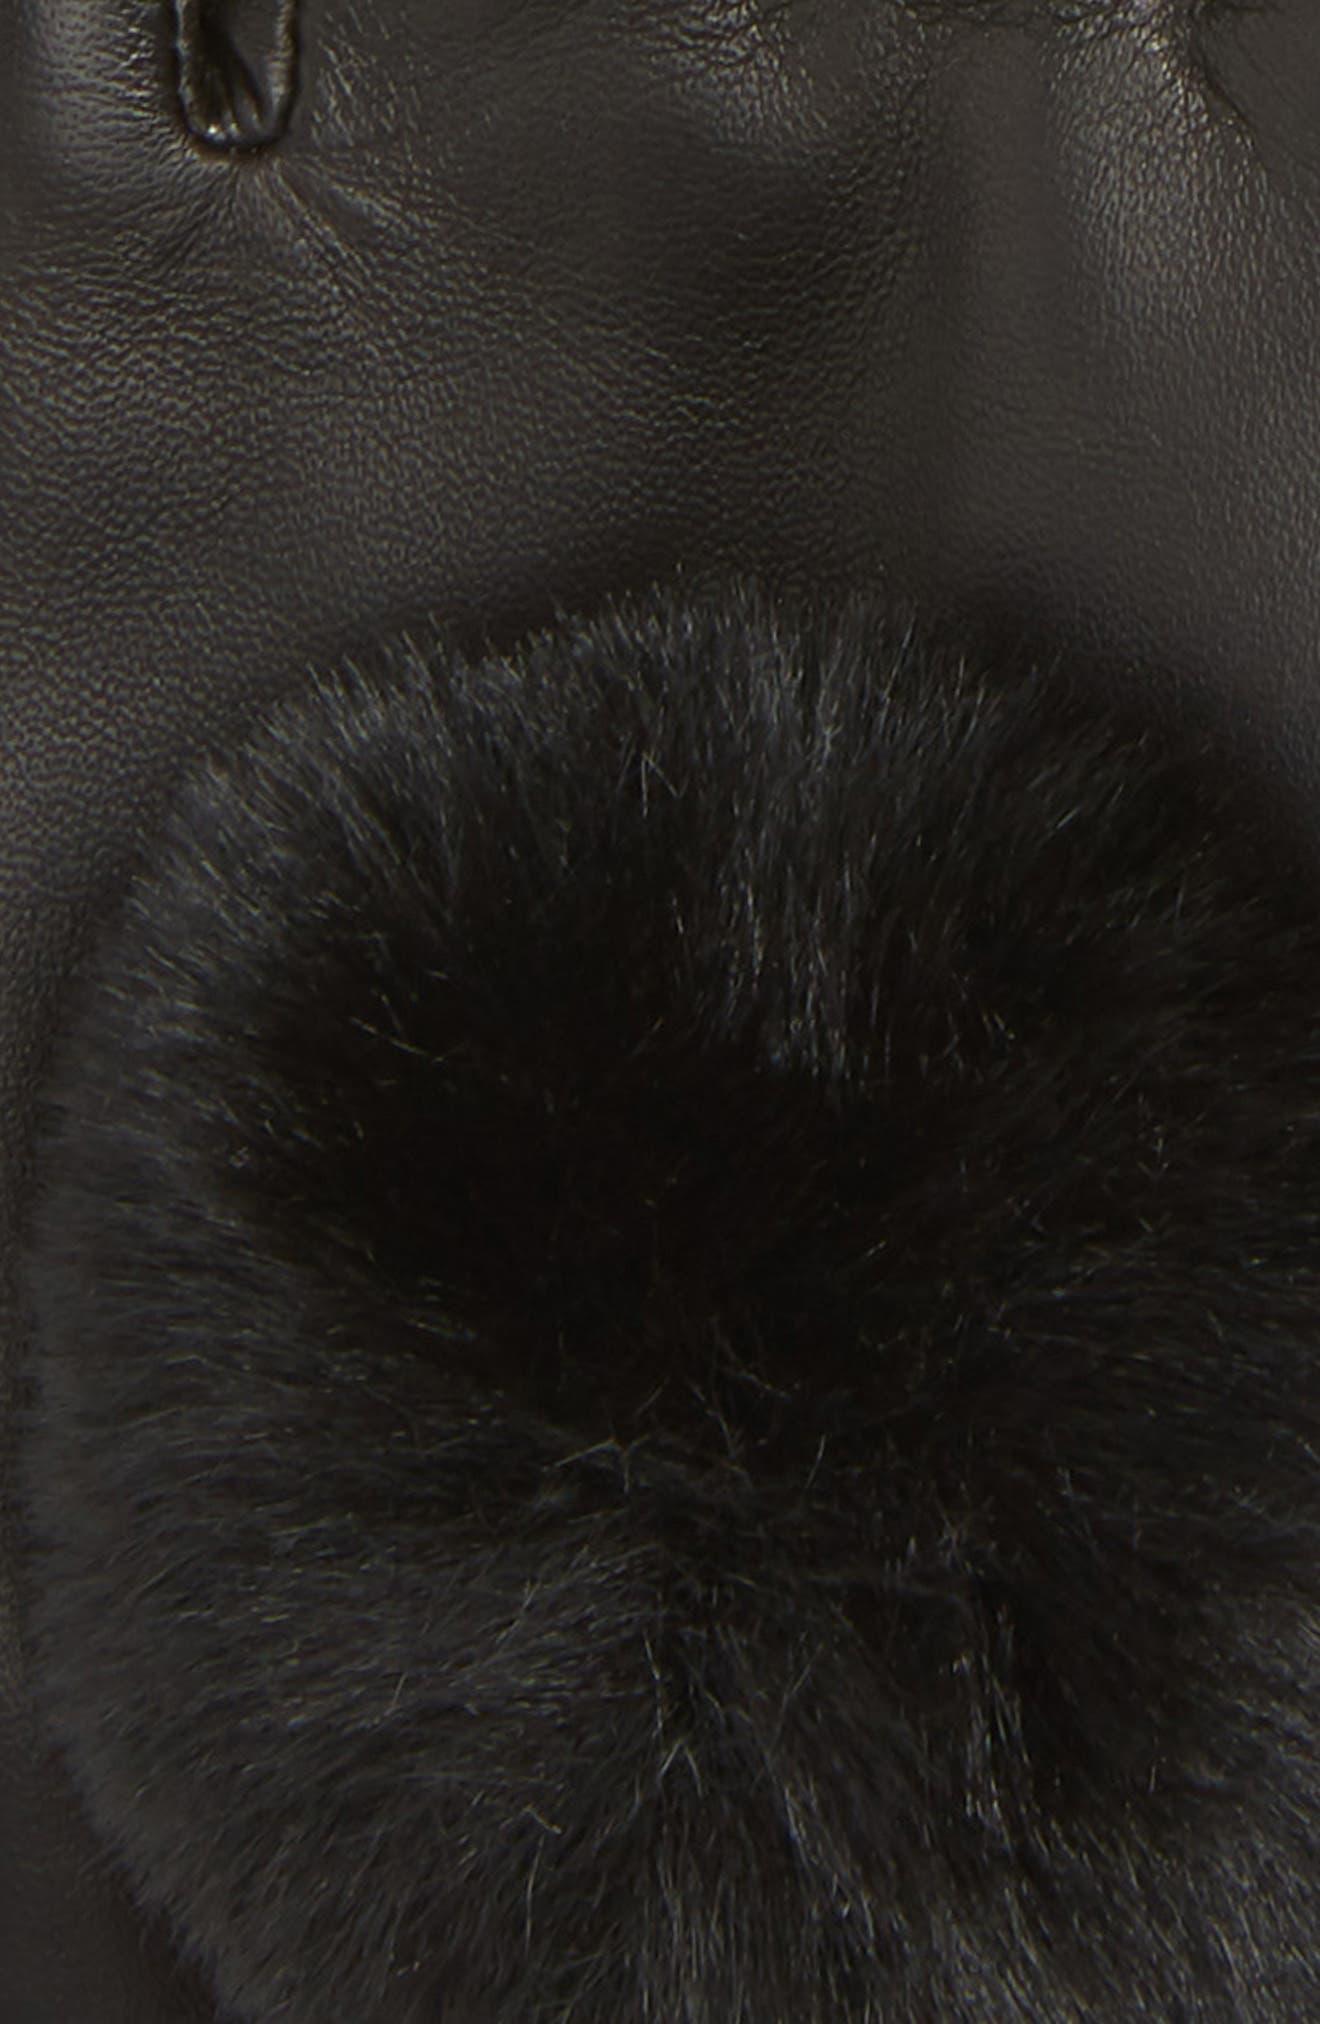 Faux Fur Pompom Lambskin Leather Gloves,                             Alternate thumbnail 2, color,                             BLACK COMBO